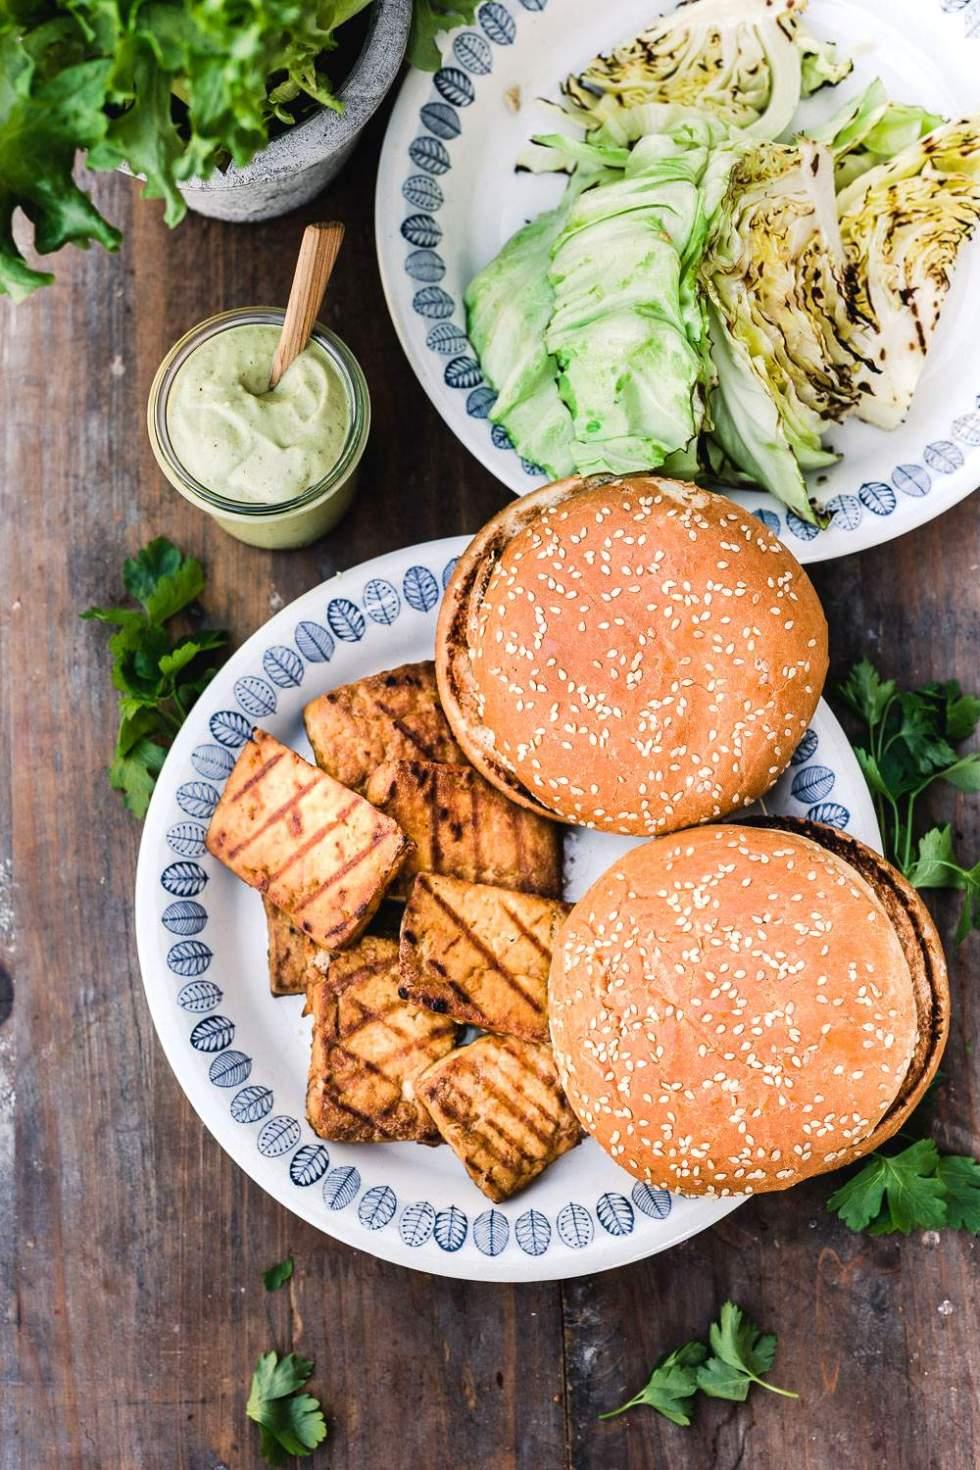 Grilled vegan caesar salad tofu burger with garlic oil